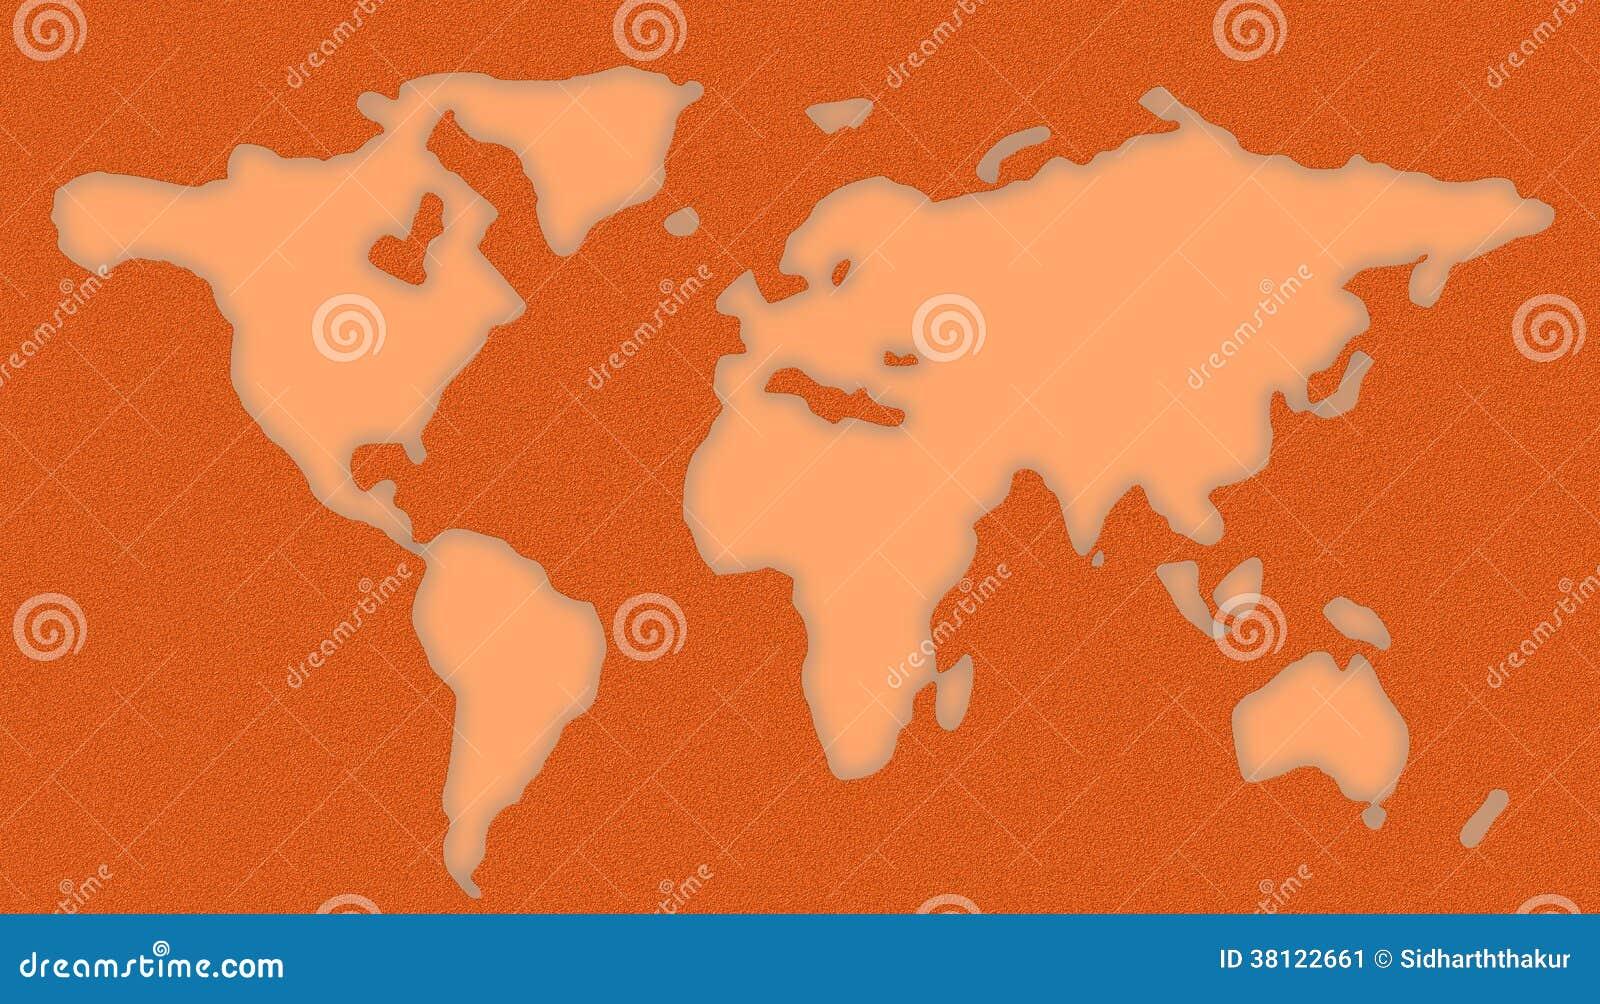 World Map Stencil Stock Image Image 38122661